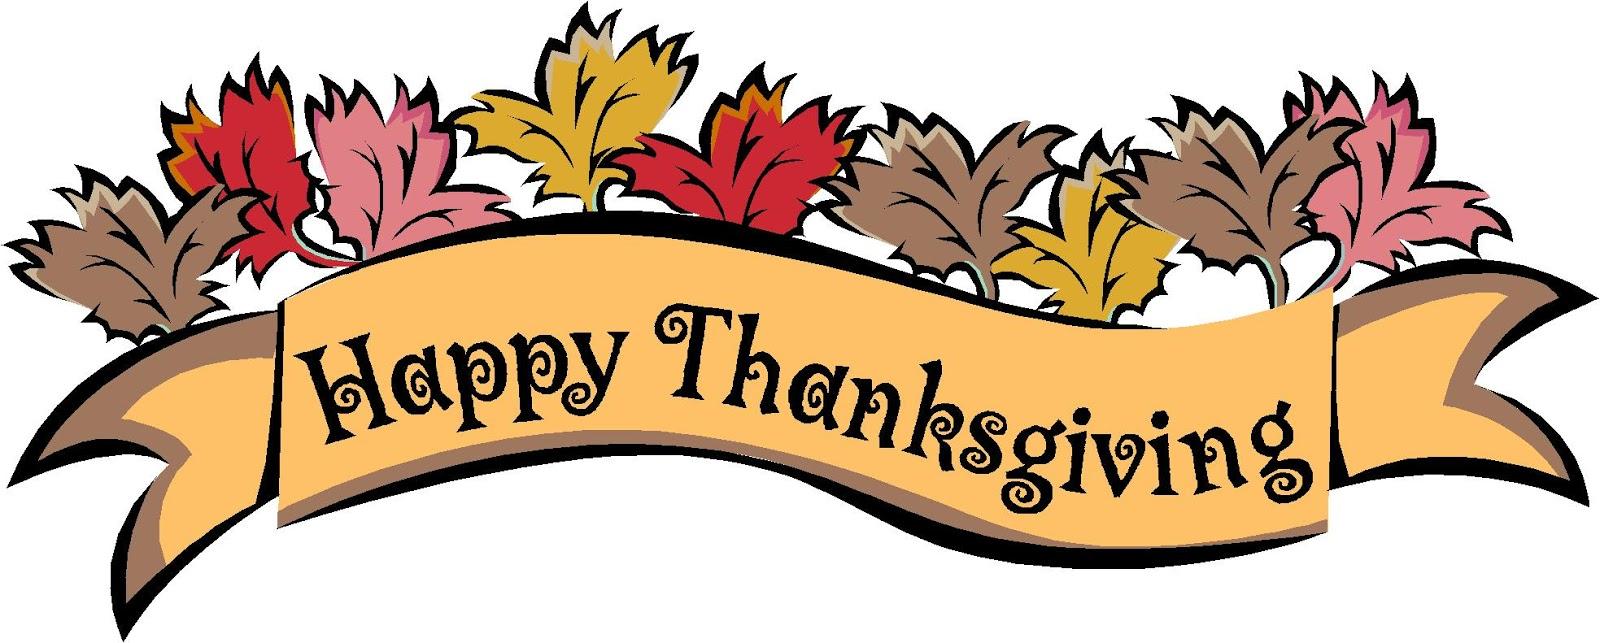 1600x643 Free Christian Thanksgiving Clip Art